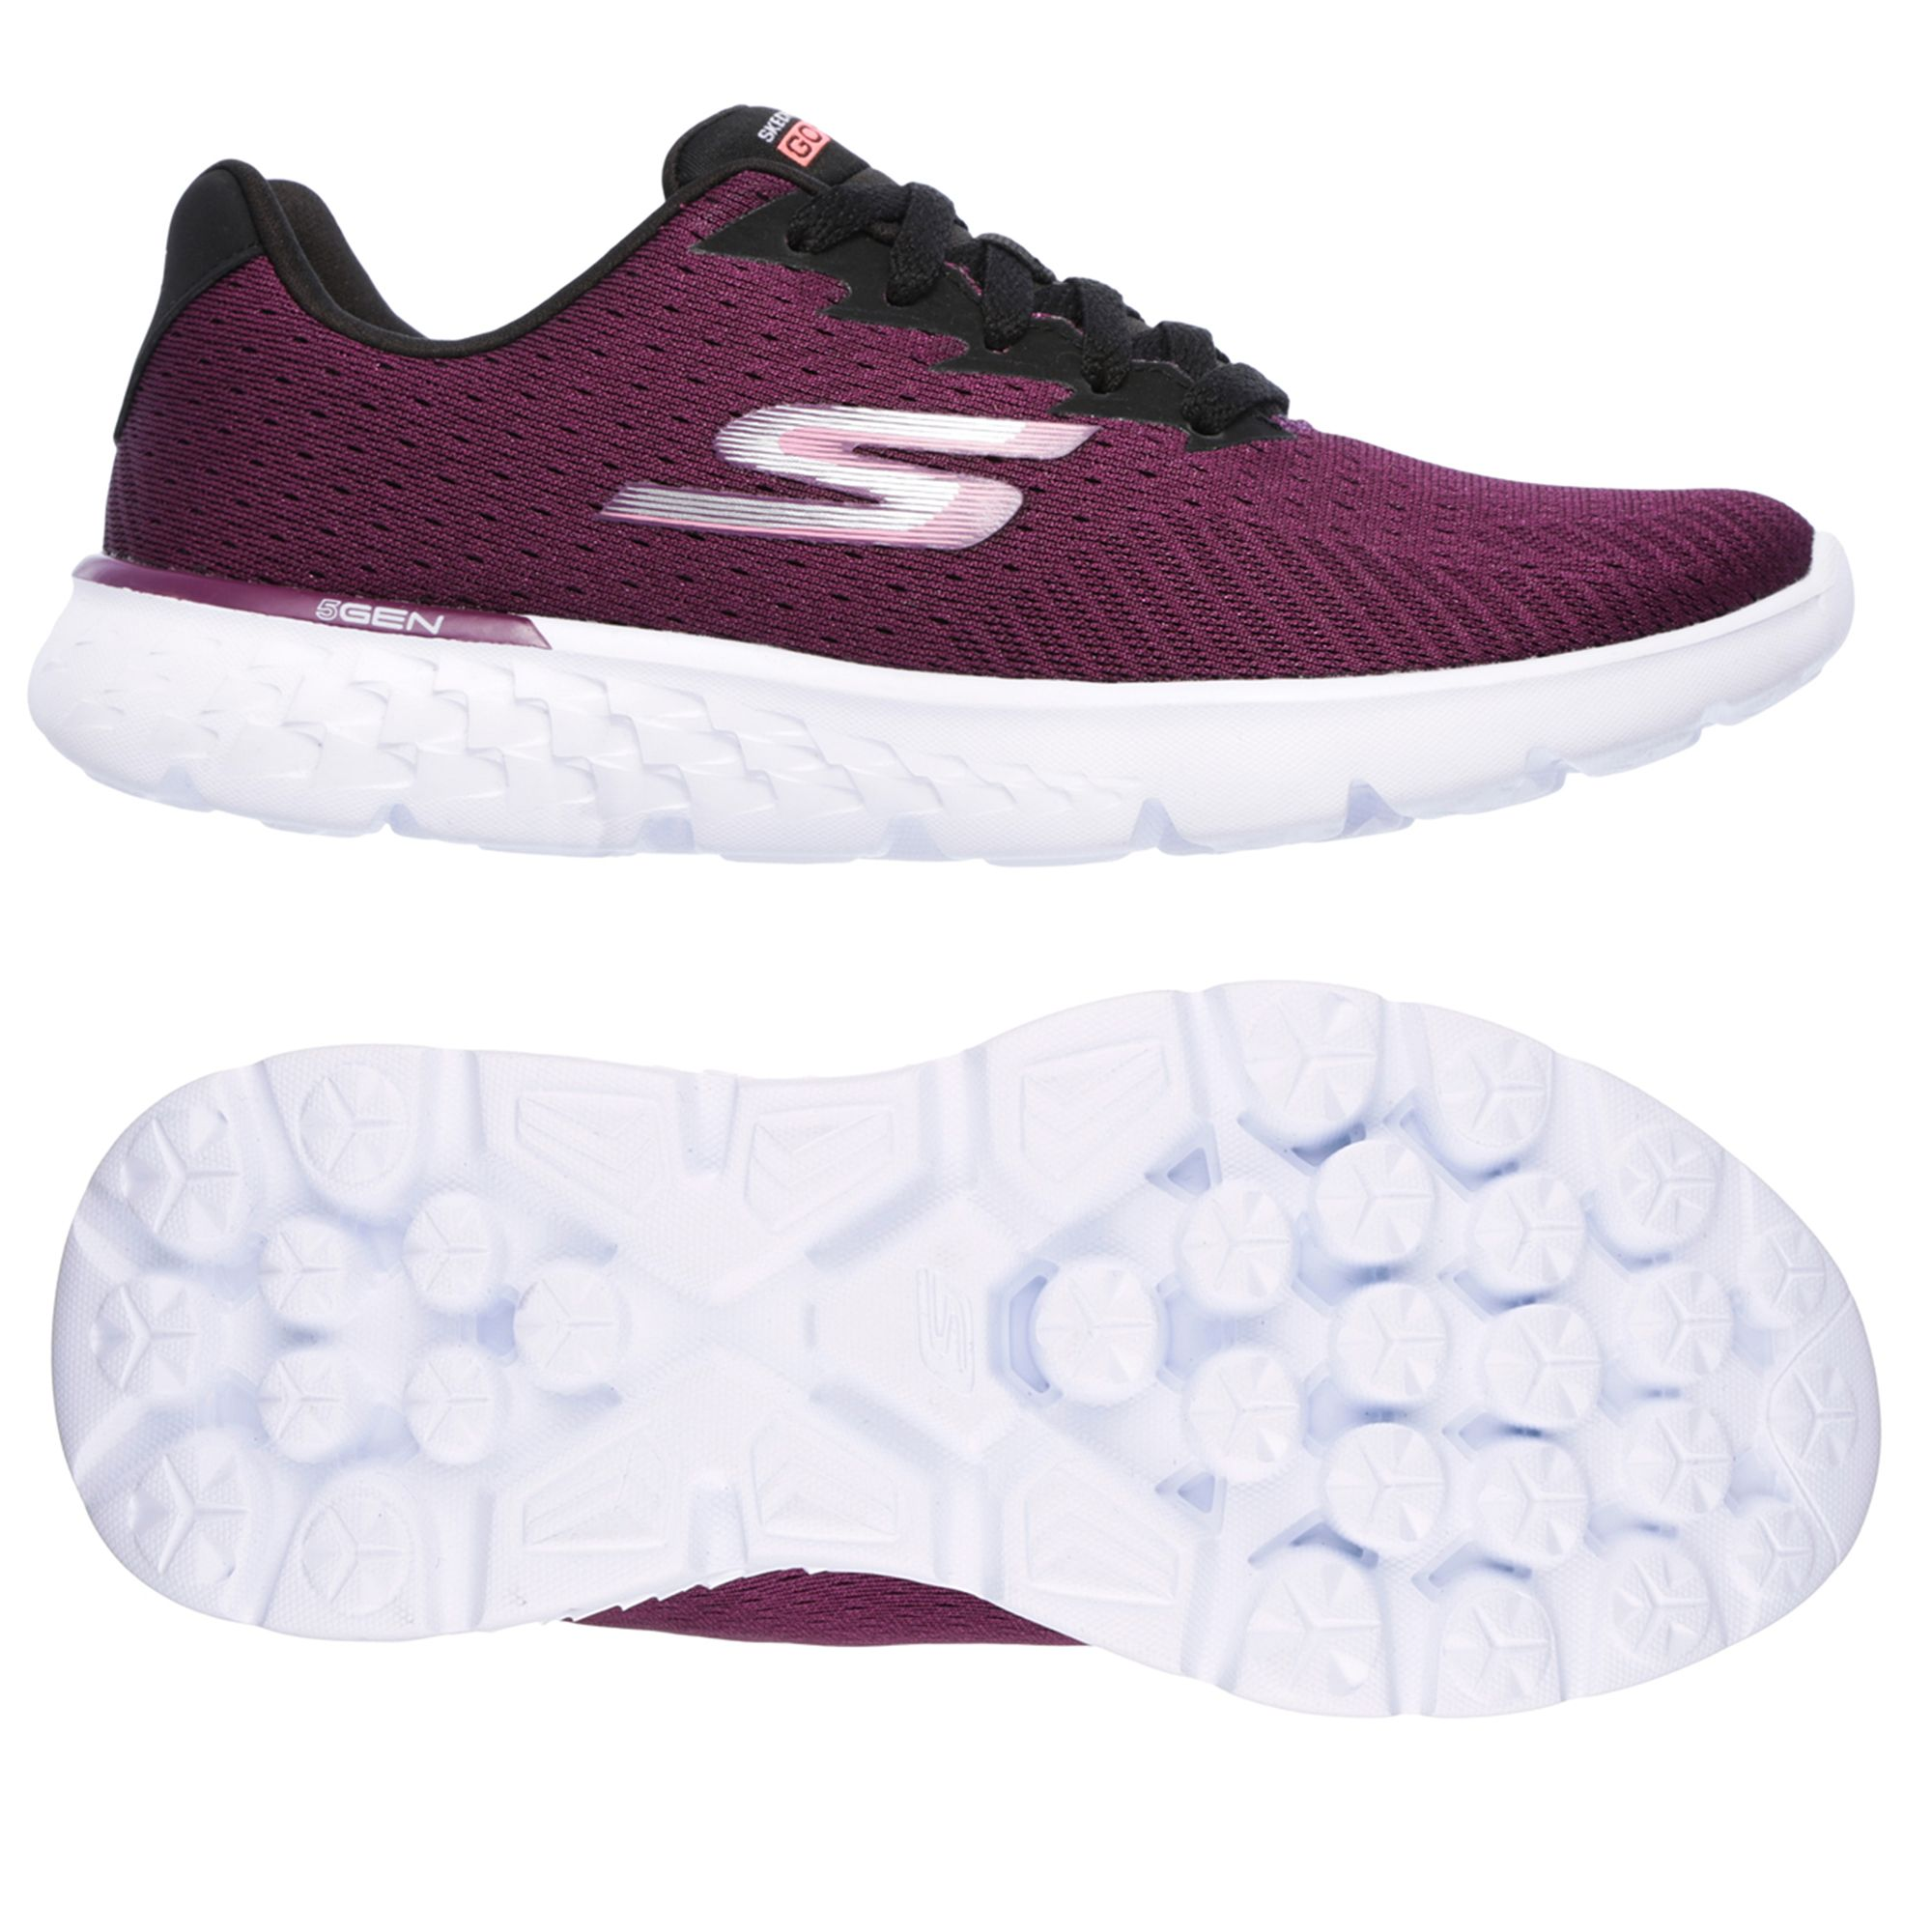 Skechers Go Run 400 Sole Ladies Running Shoes